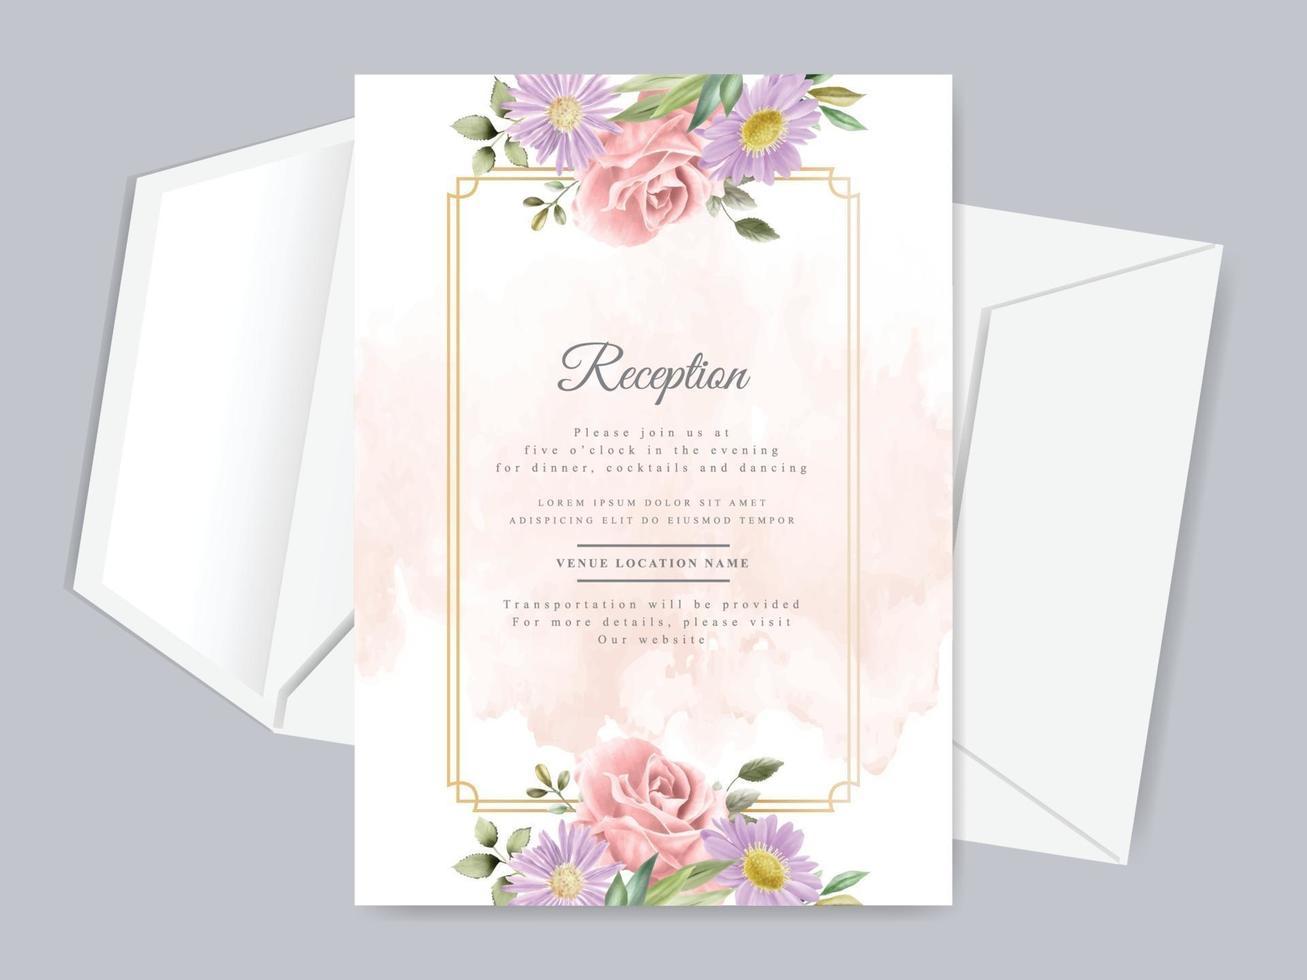 Beautiful floral hand drawn wedding invitation reception card template vector